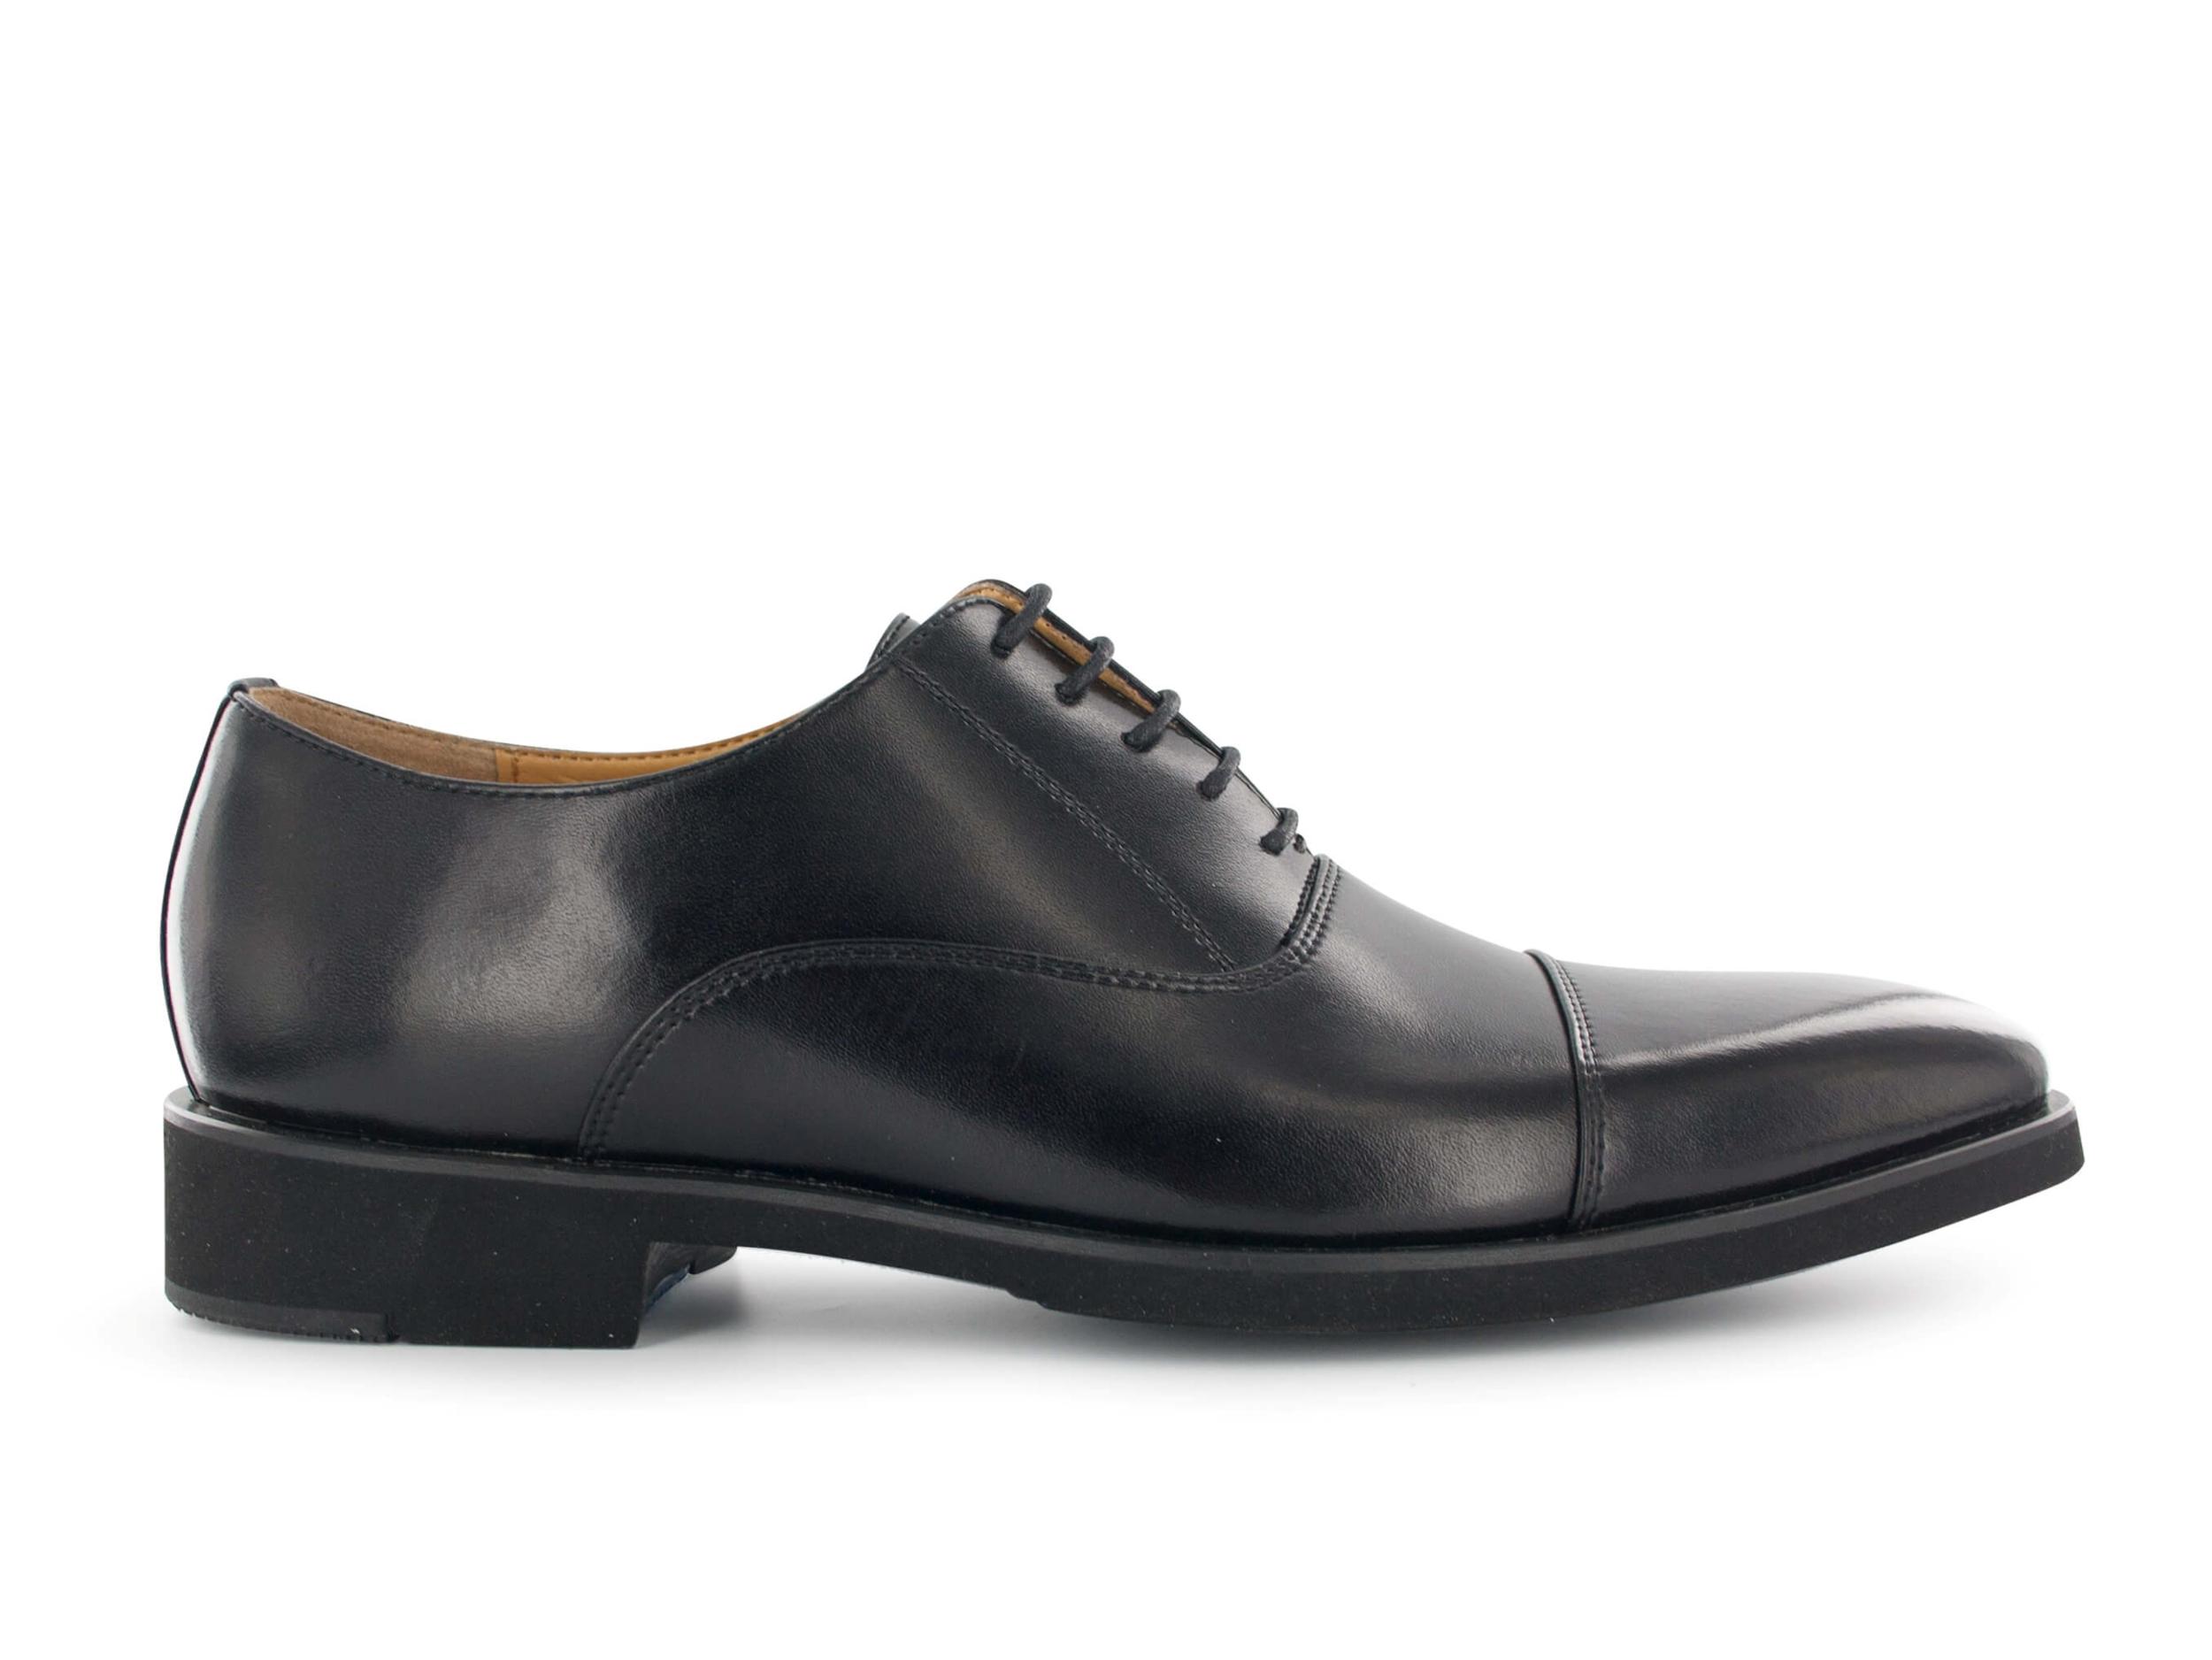 970bd0a2871708 Chaussures de Service - mylookpro.com